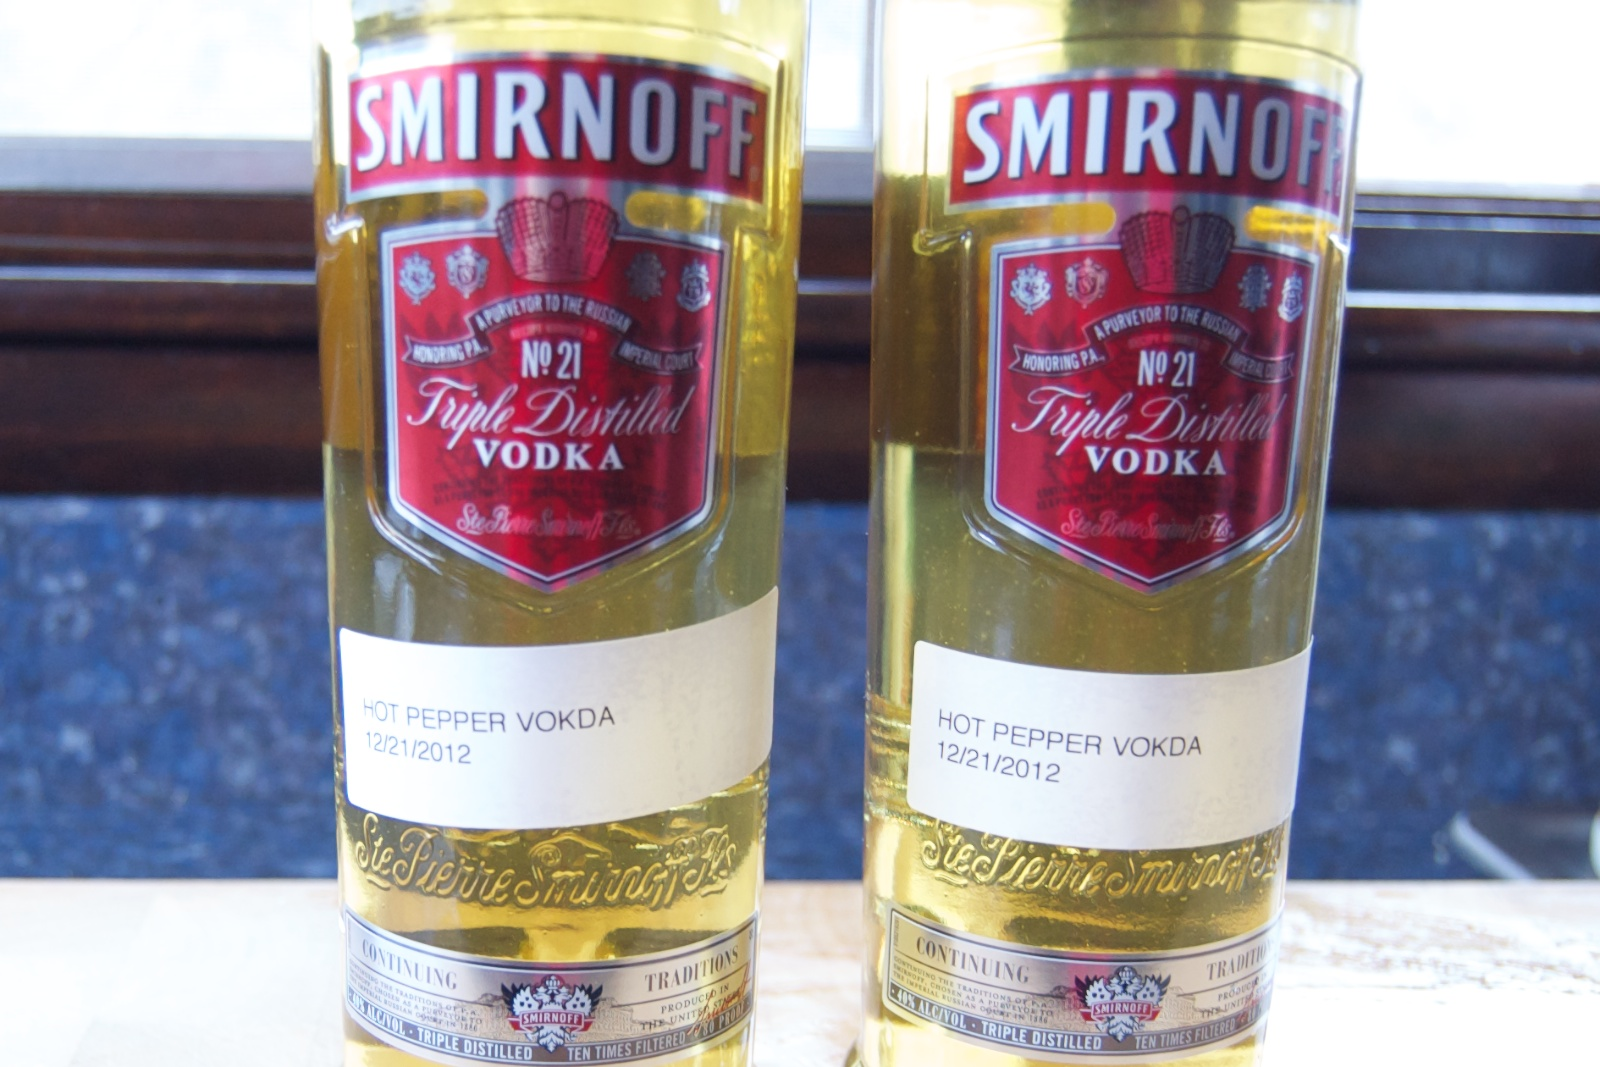 http://blog.rickk.com/food/2012/12/22/ate.2012.12.21.c1.jpg